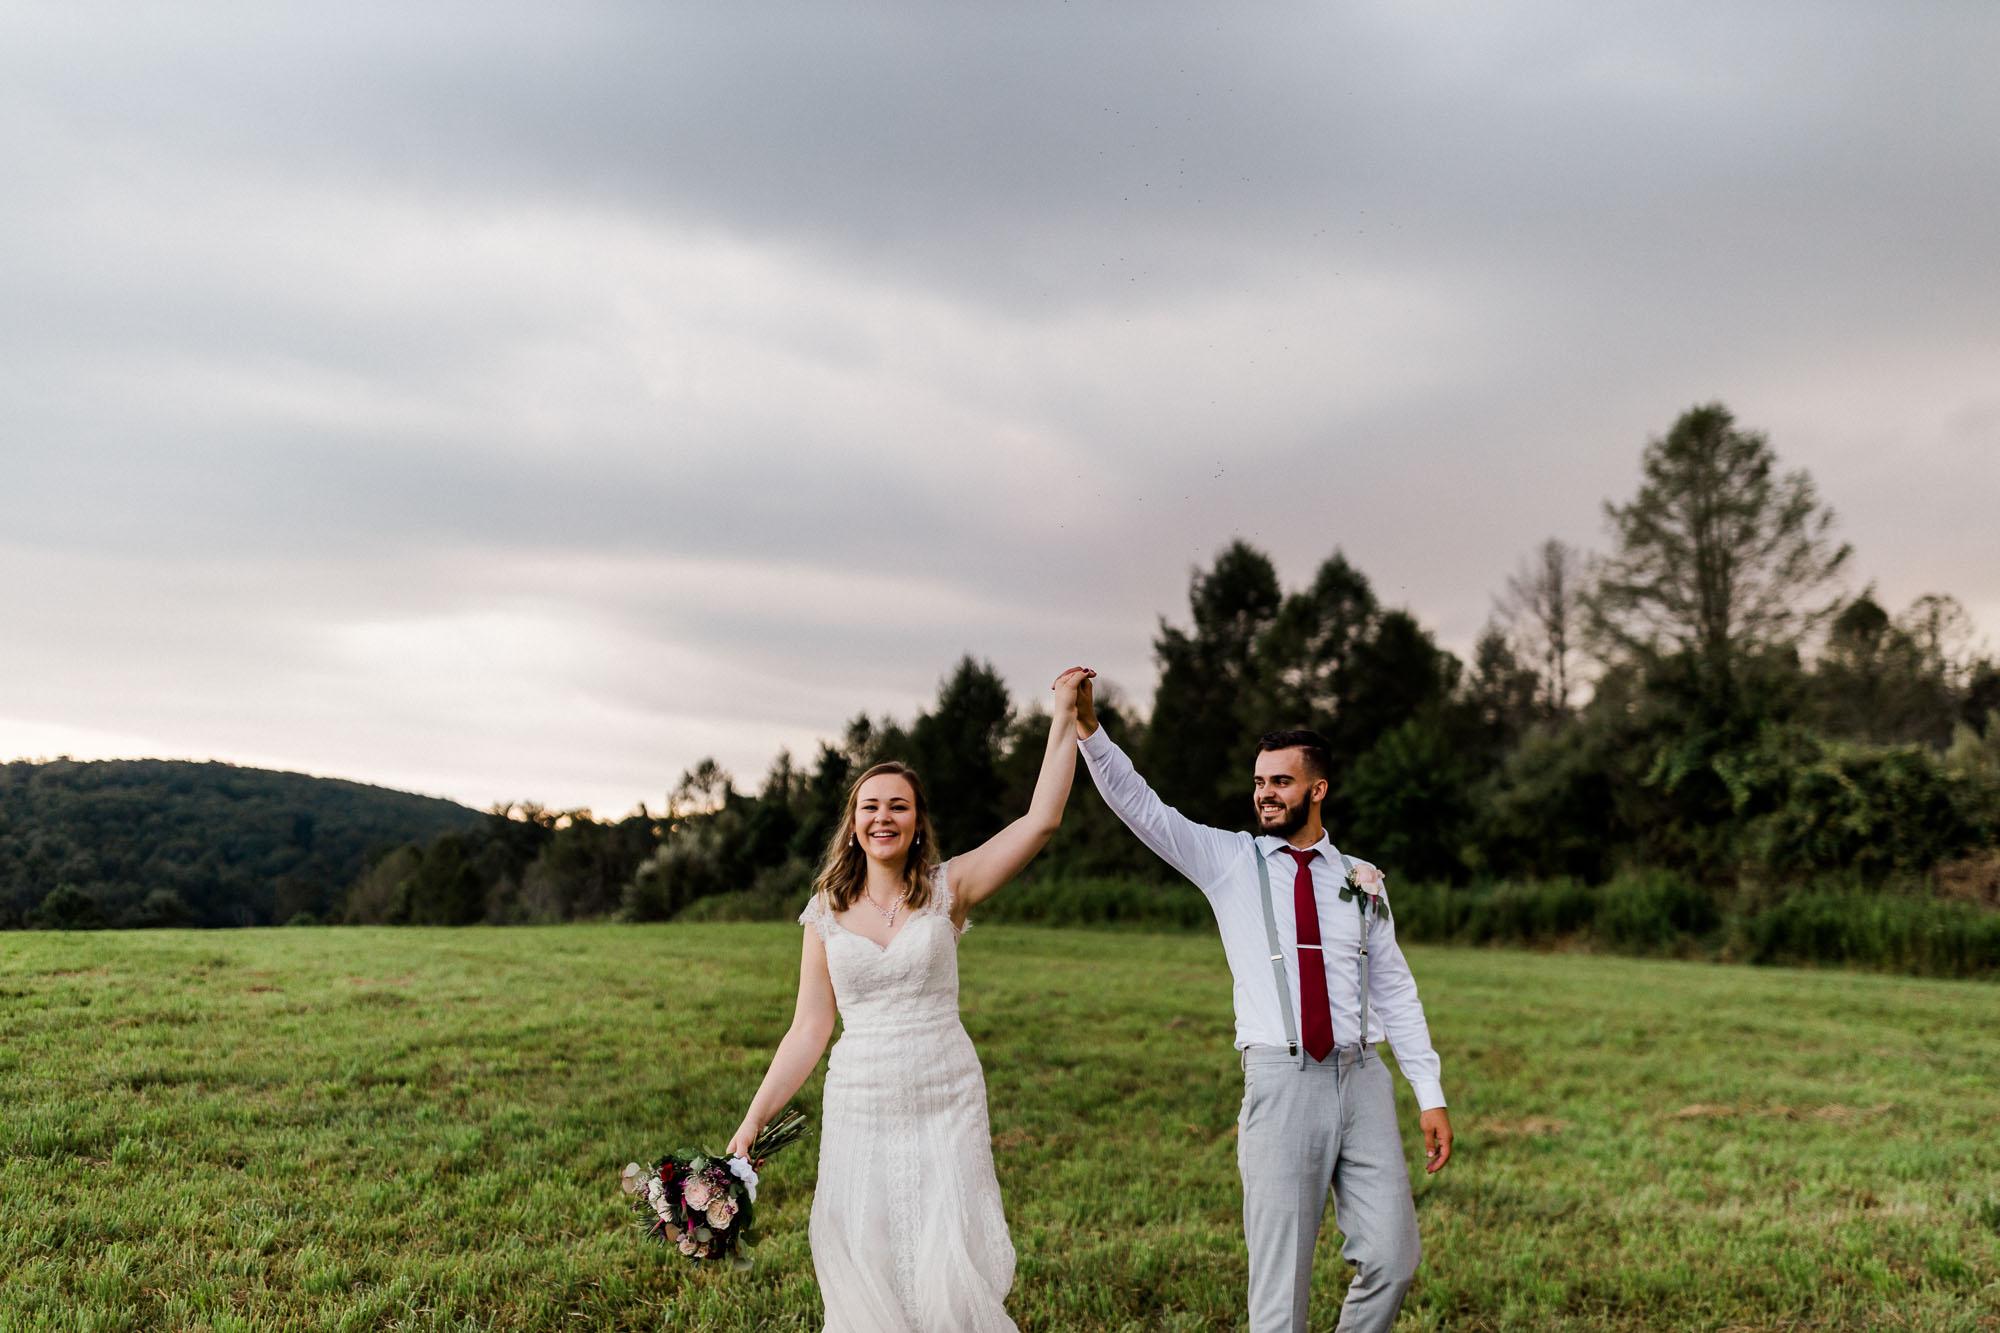 Stillwater-Christian_Church_Wedding-2490.jpg